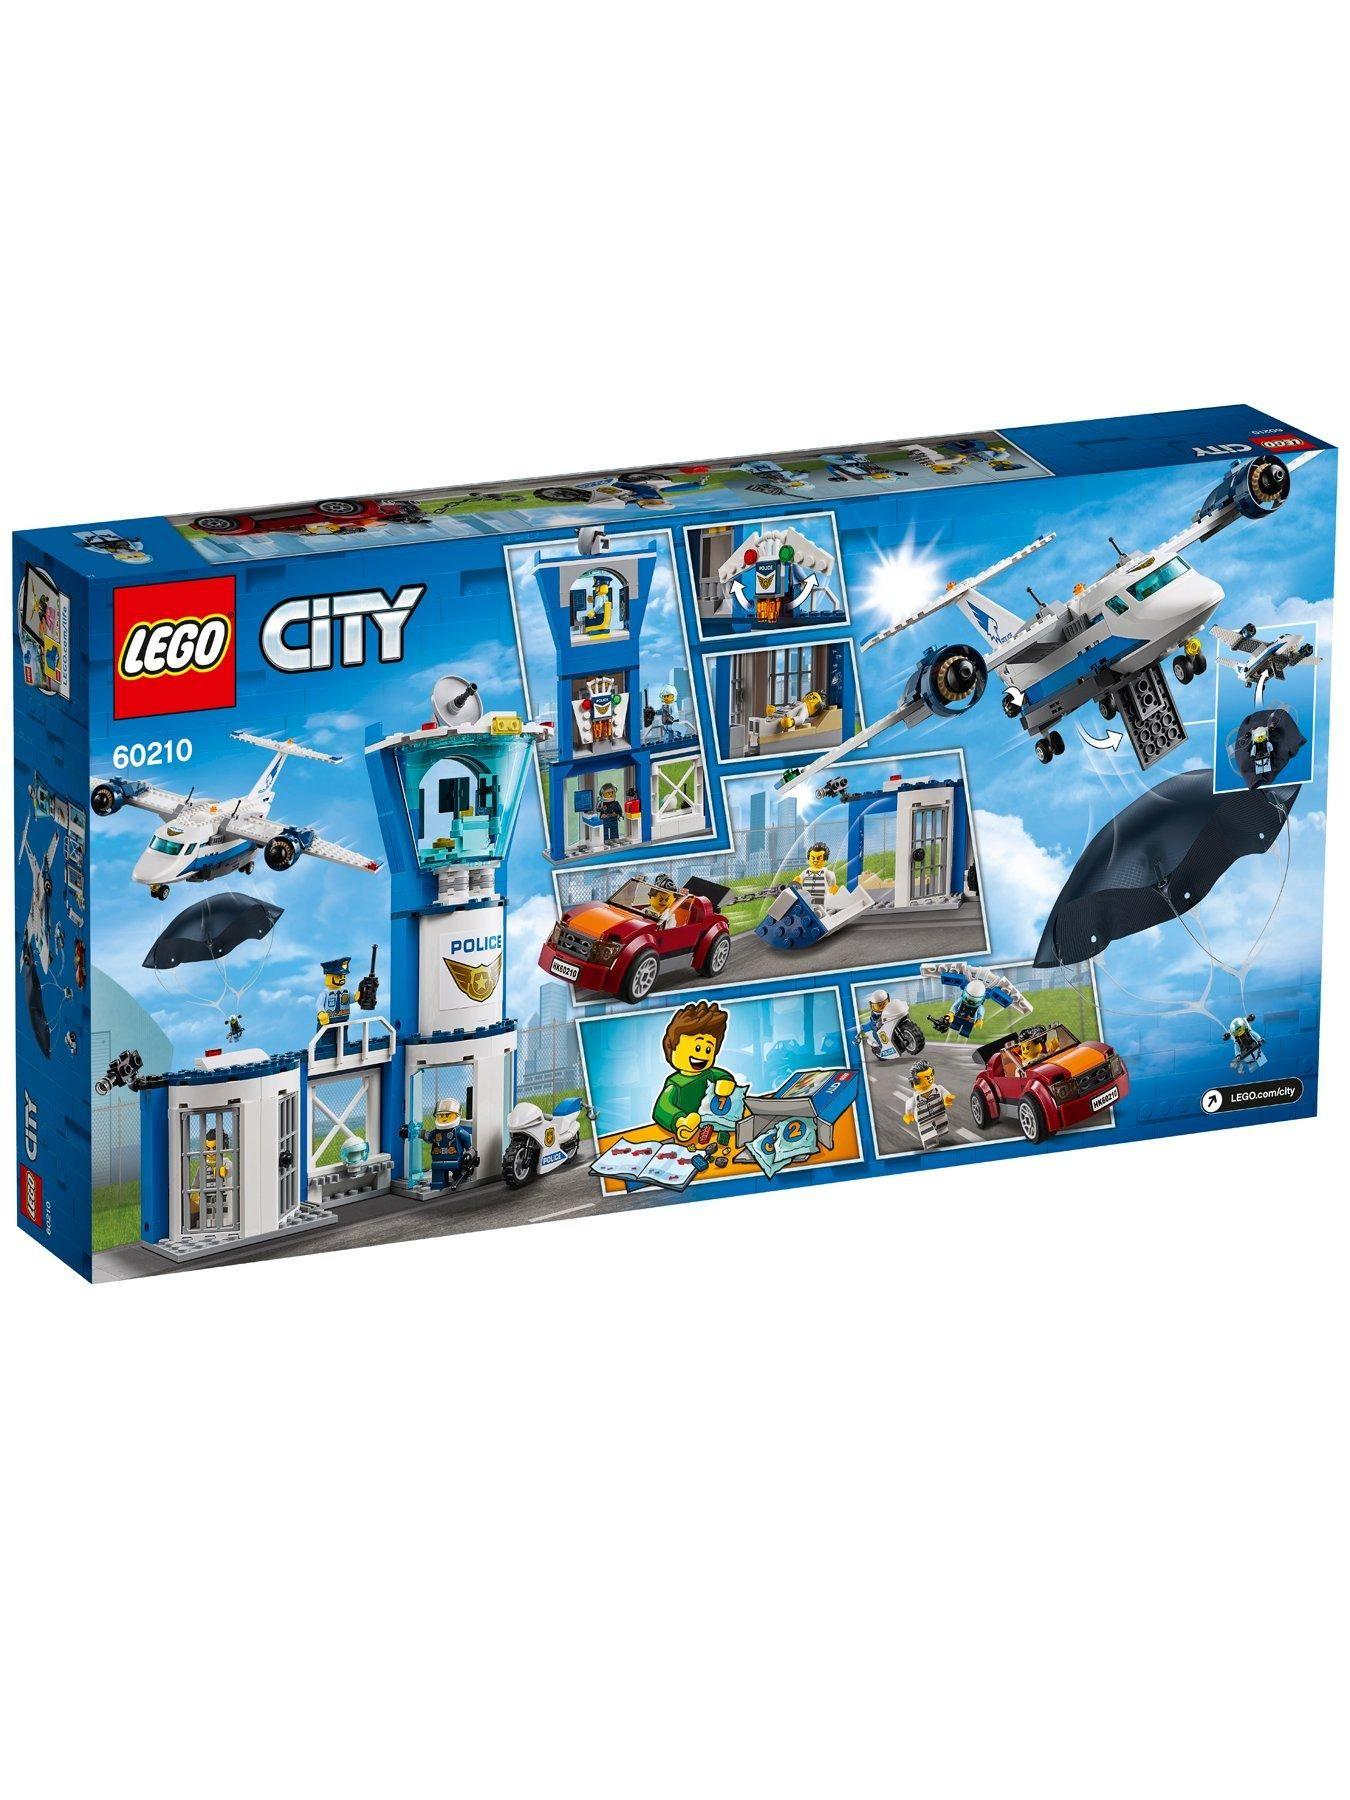 60210 Sky Police Air Base In 2020 Lego City Police Lego City Lego